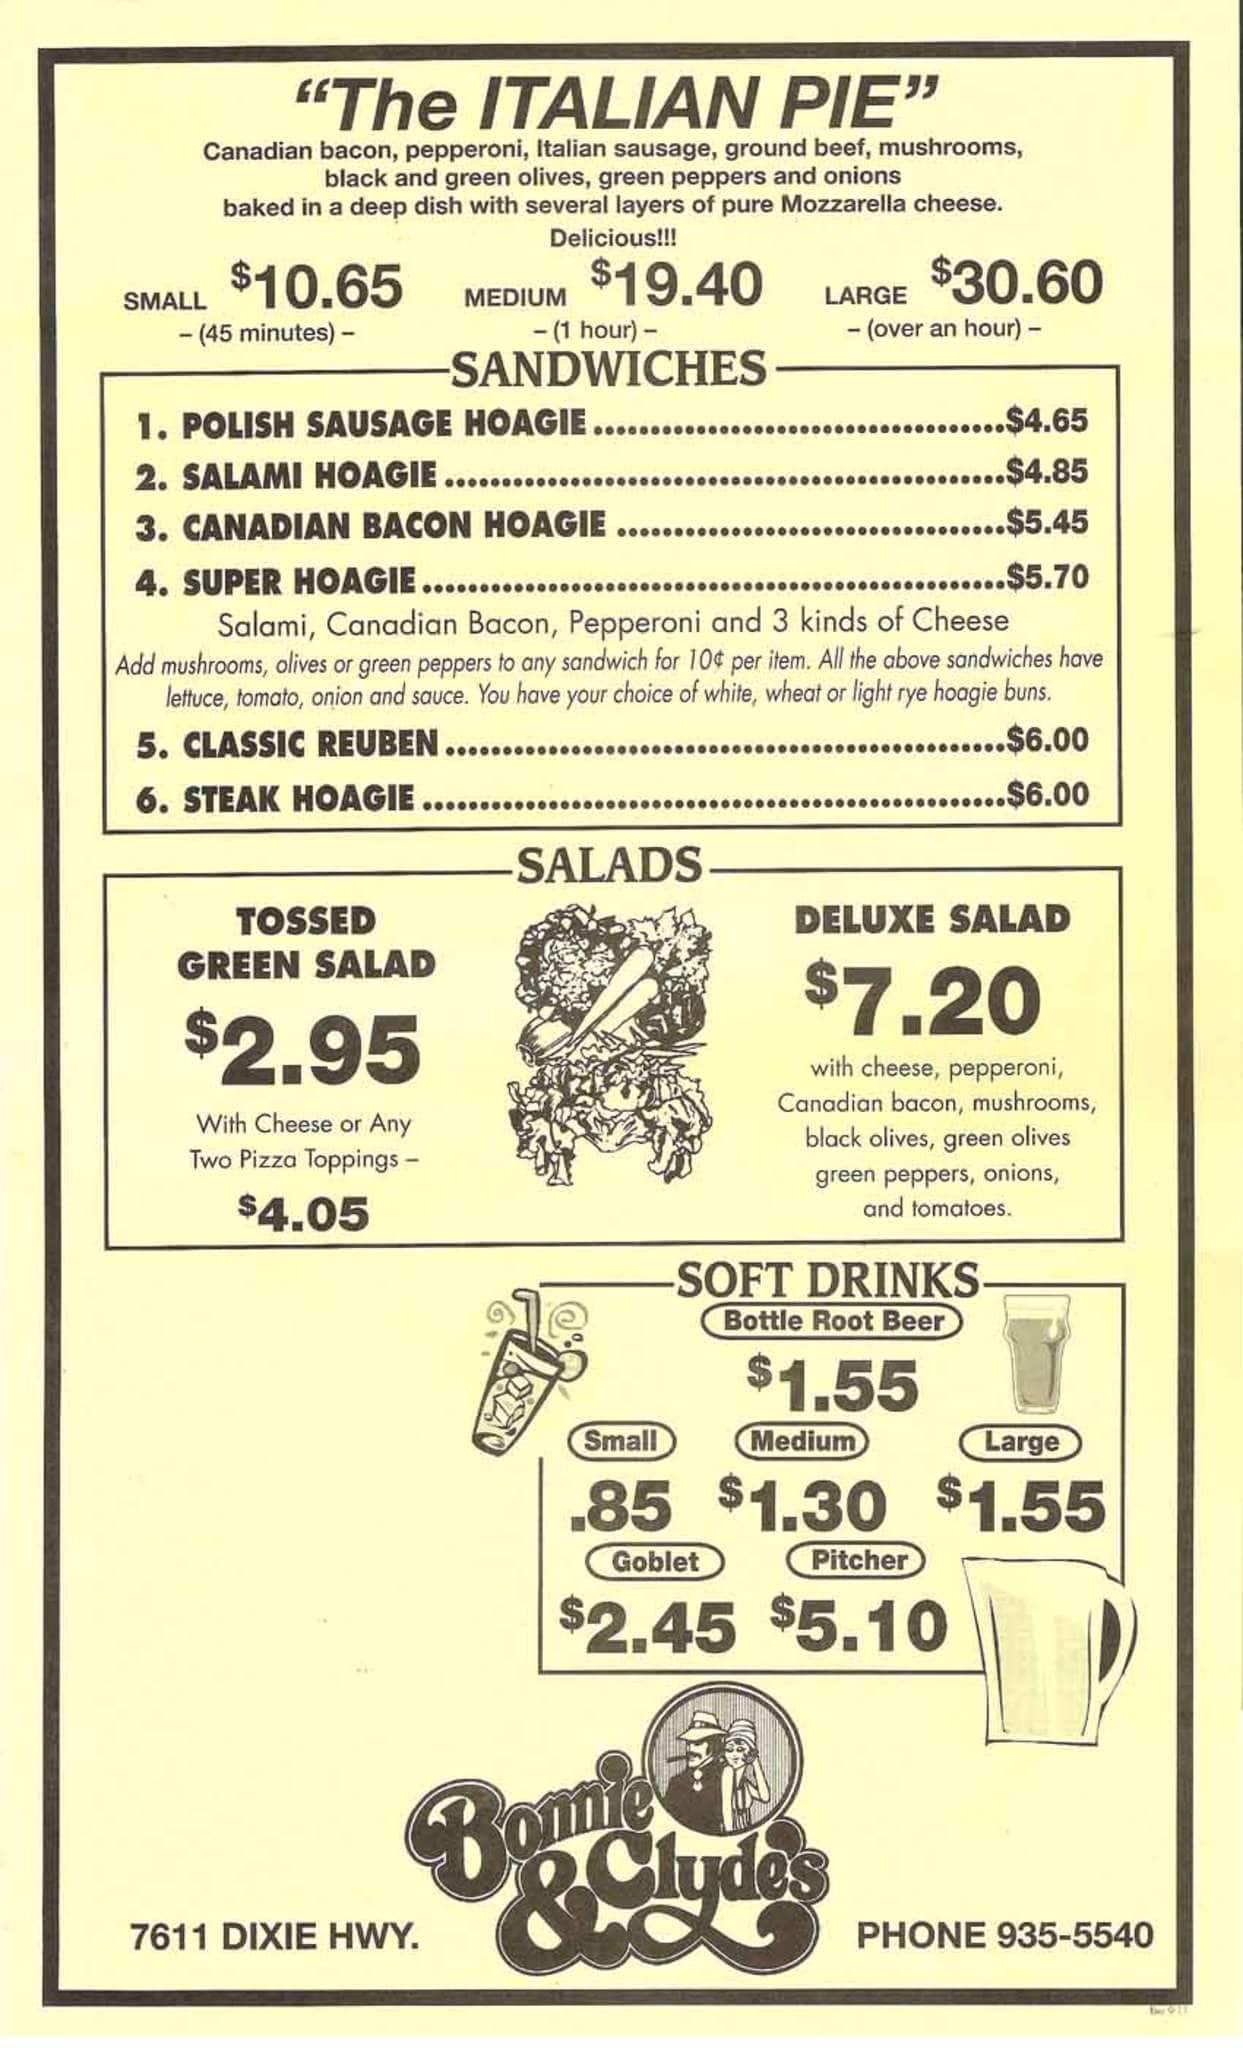 Bonnie & Clyde\'s Pizza Parlor Menu - Urbanspoon/Zomato